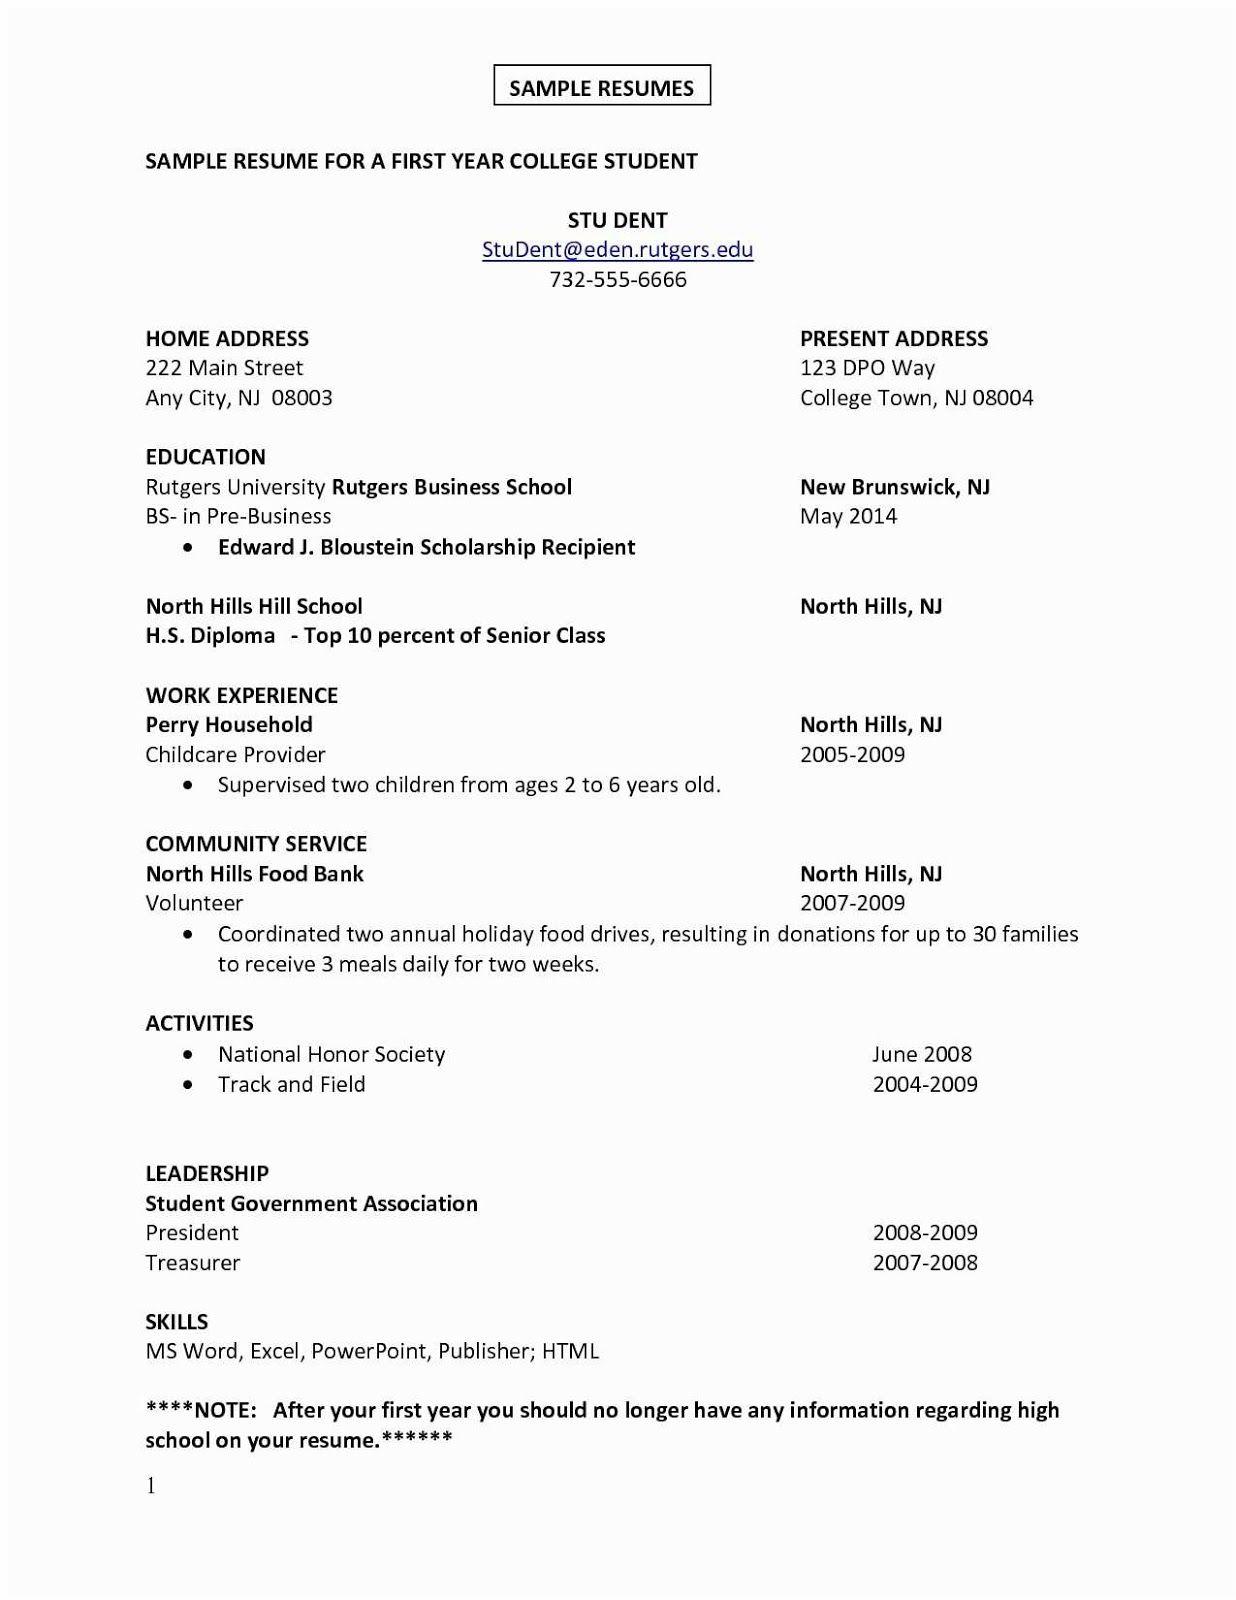 Maintenance Man Resume Sample 2019 Maintenance Man Resume